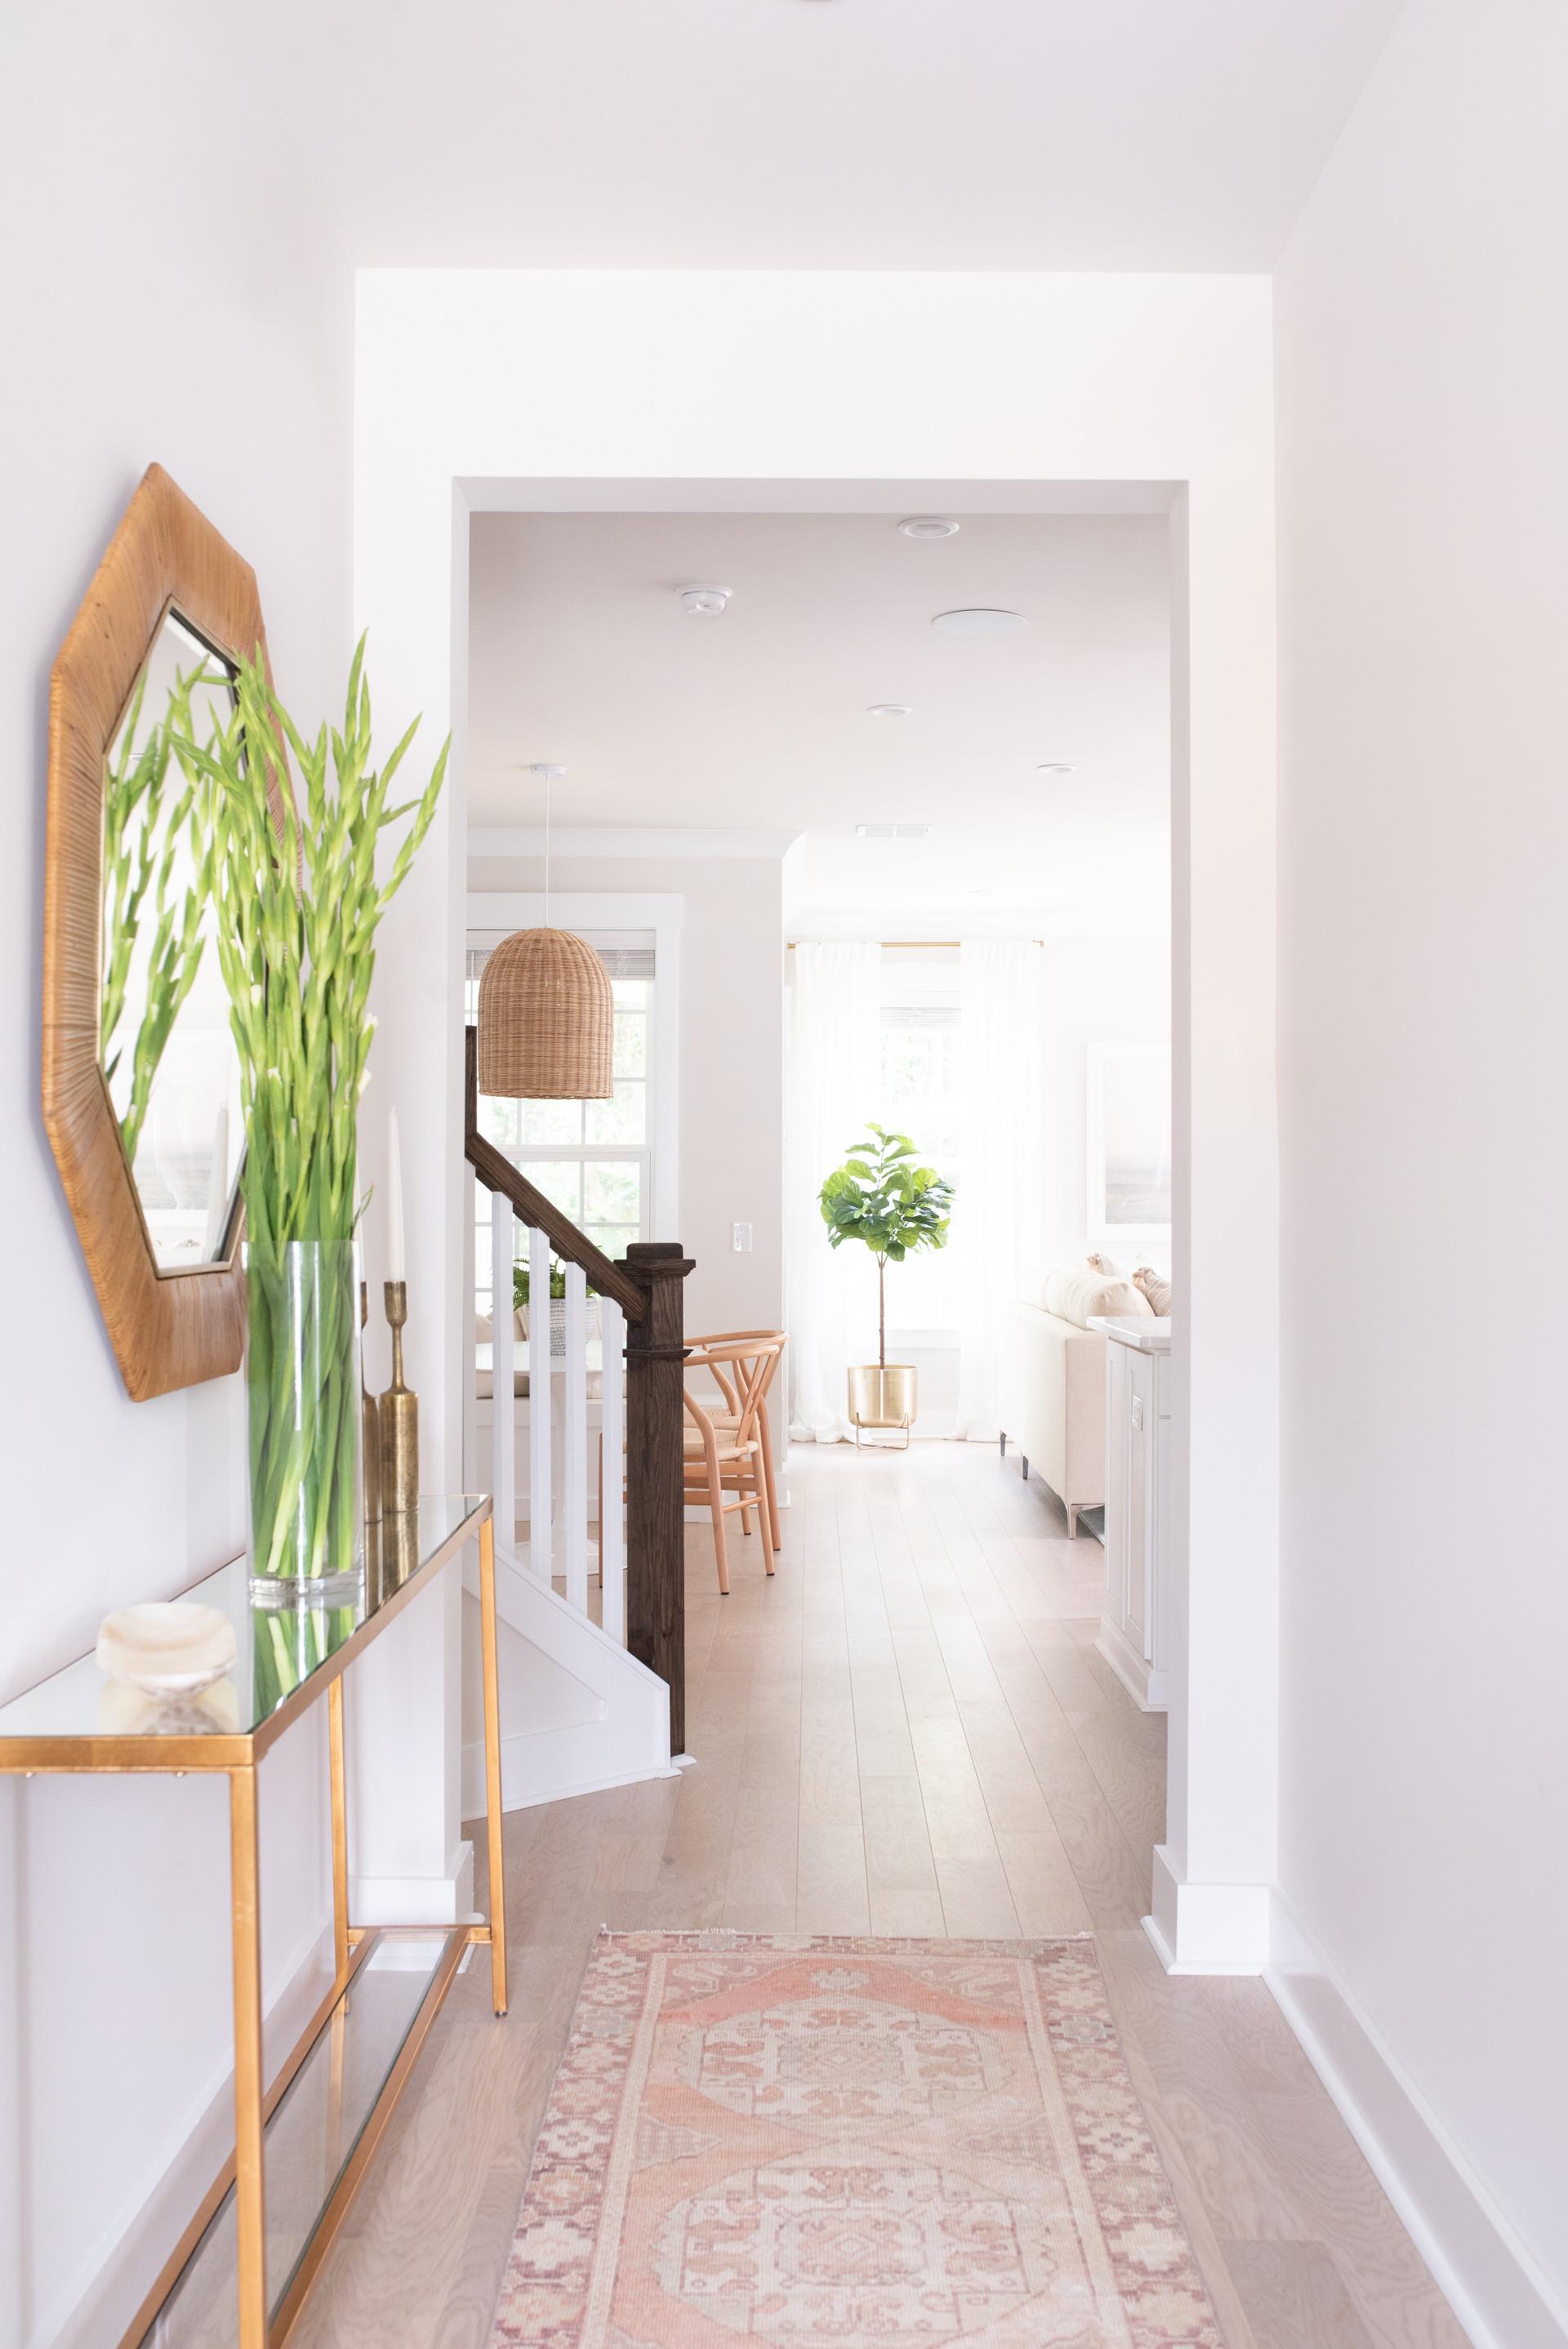 Perch-DI-Home-Hallway-8.jpg